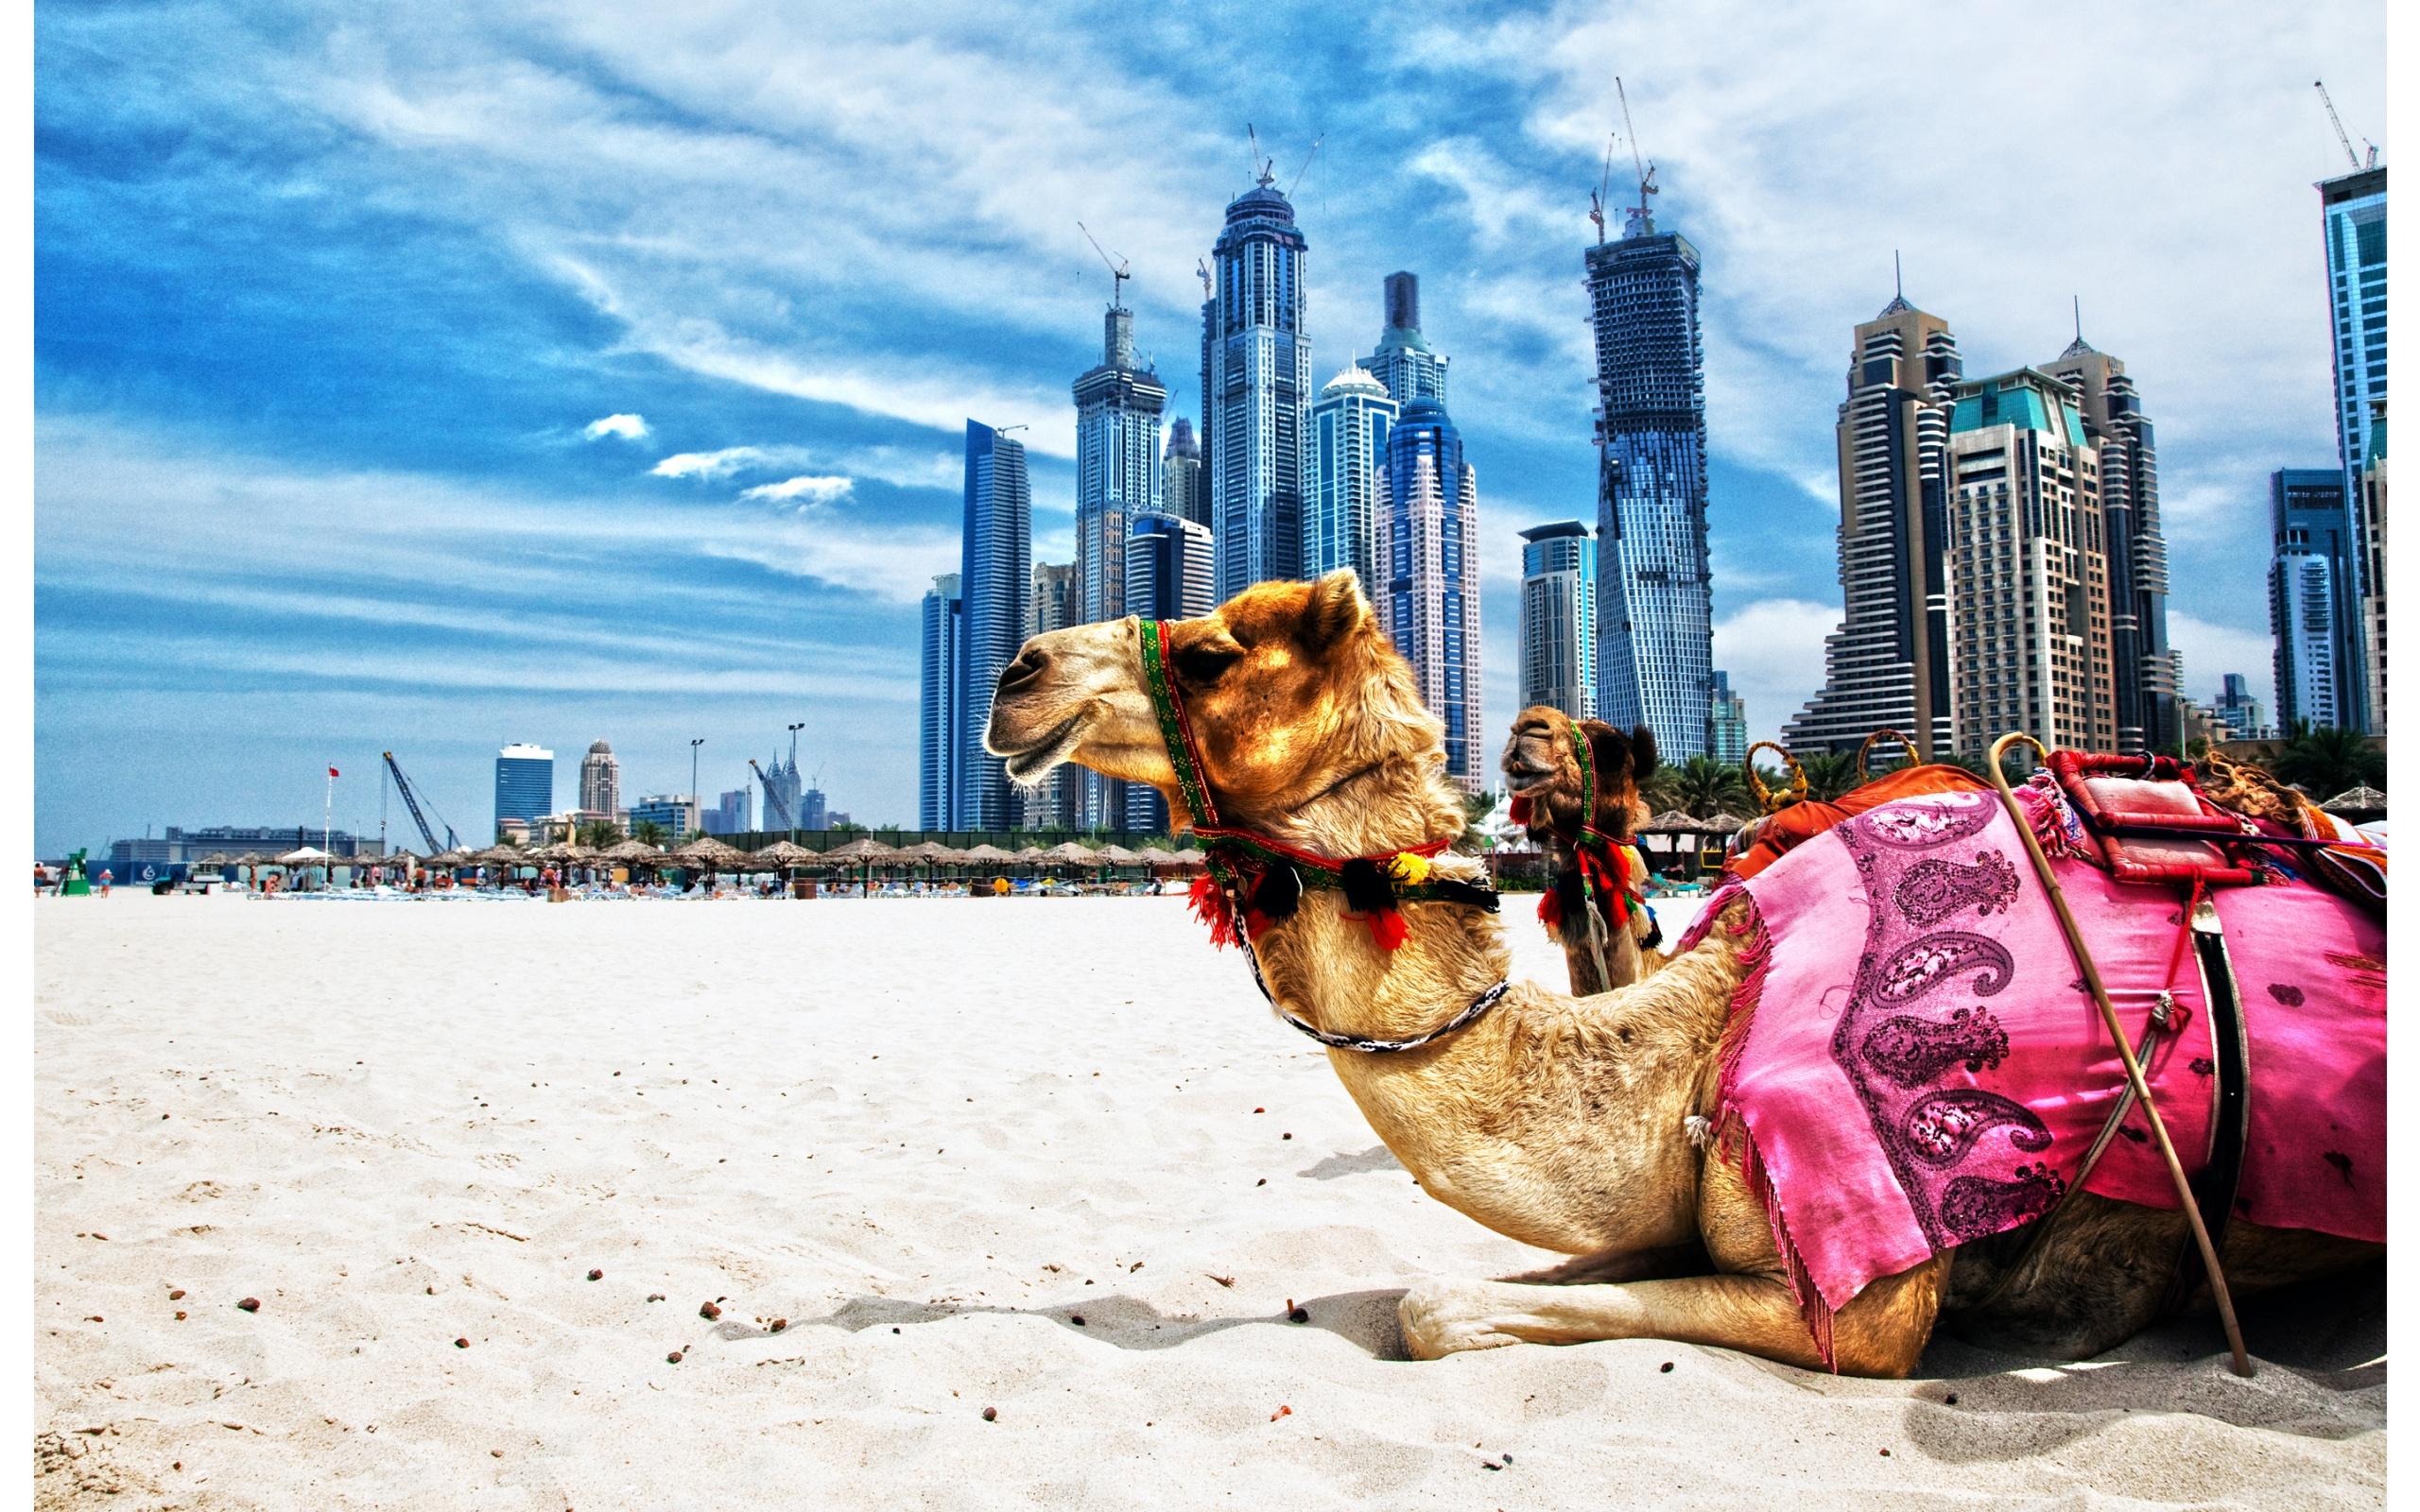 LAS MAGIAS DEL ORIENTE (Turquia, Egipto y Dubai)